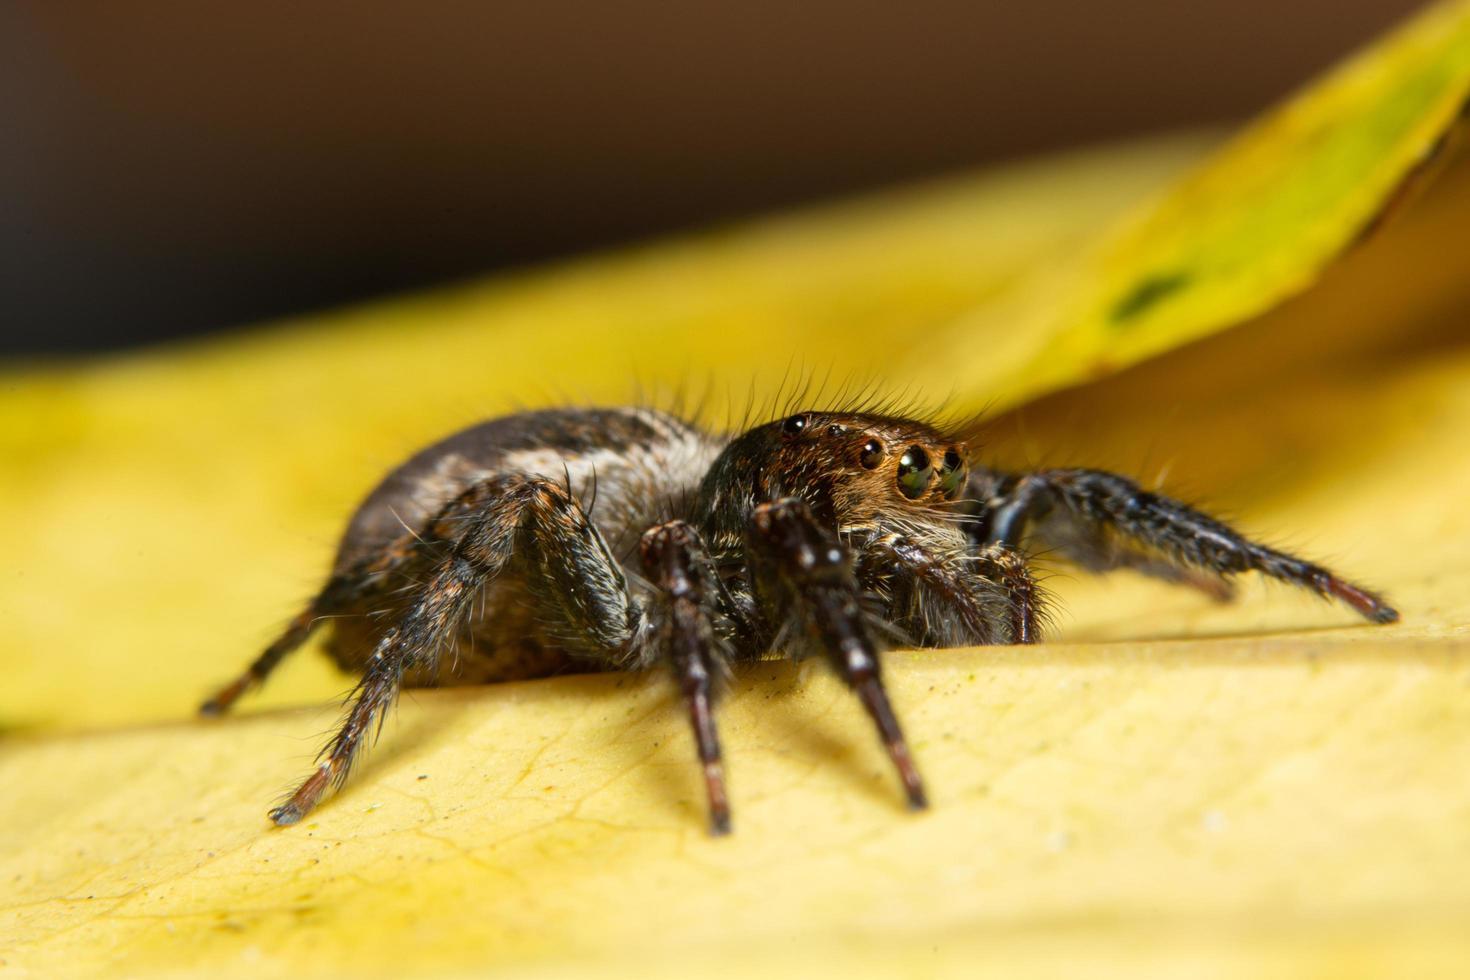 araignée macro sur une feuille jaune photo